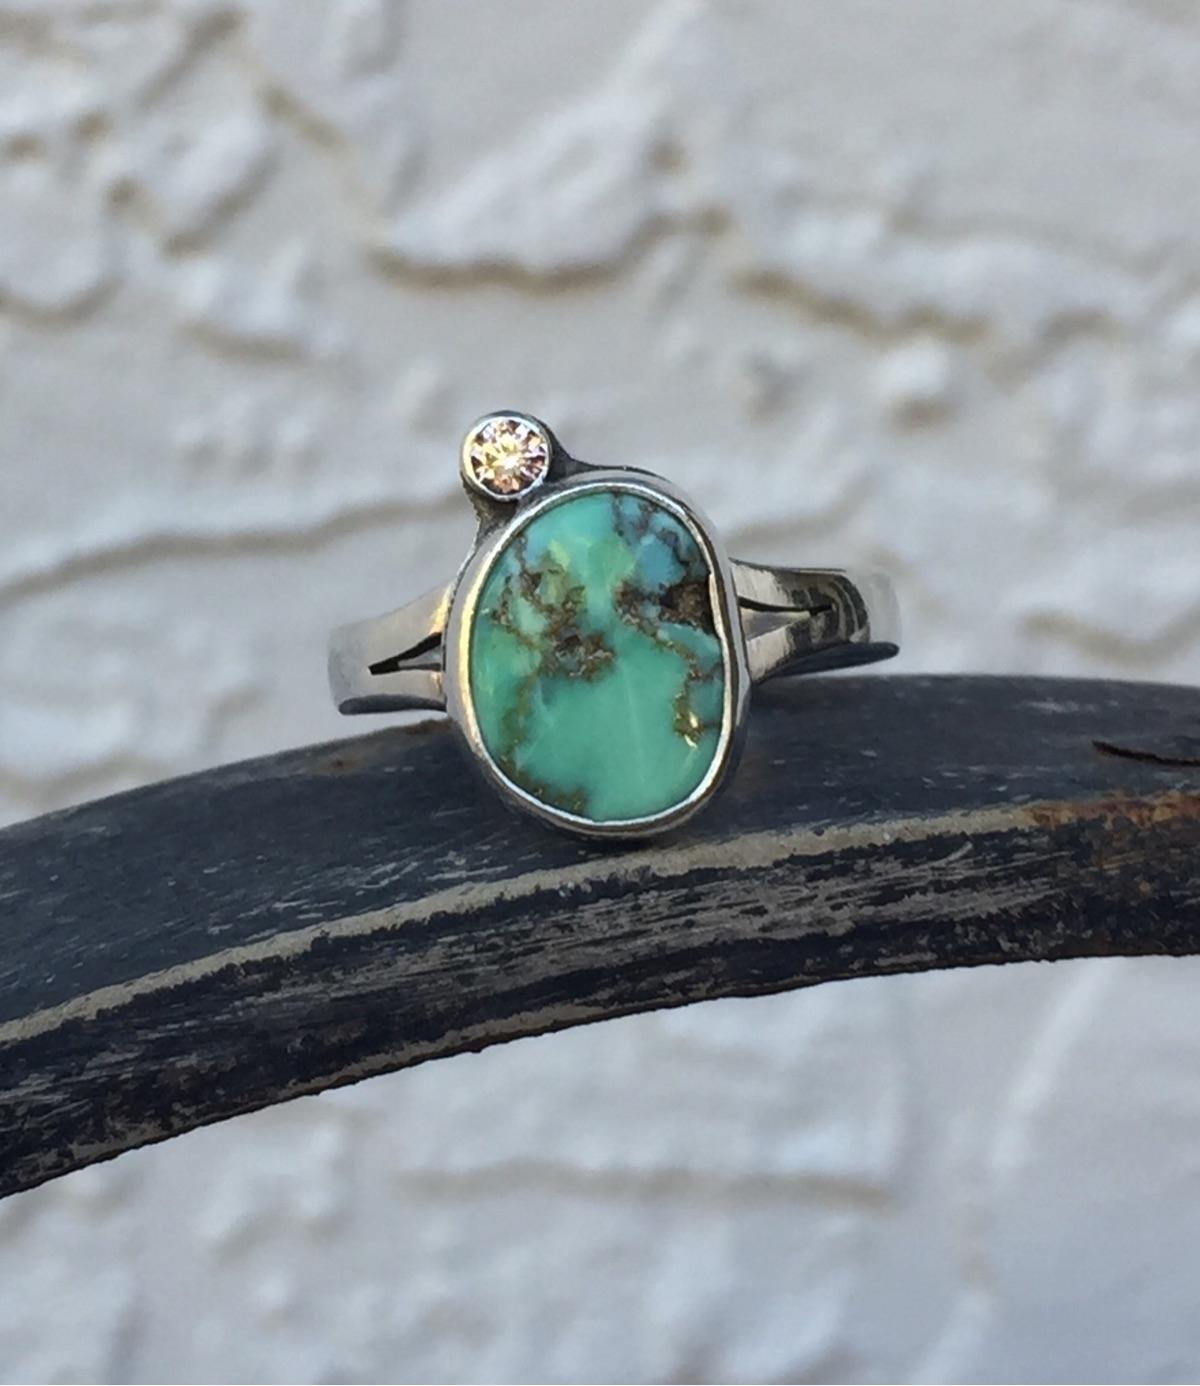 Lander Turquoise ring, size 6.5 - lizix26 | ello